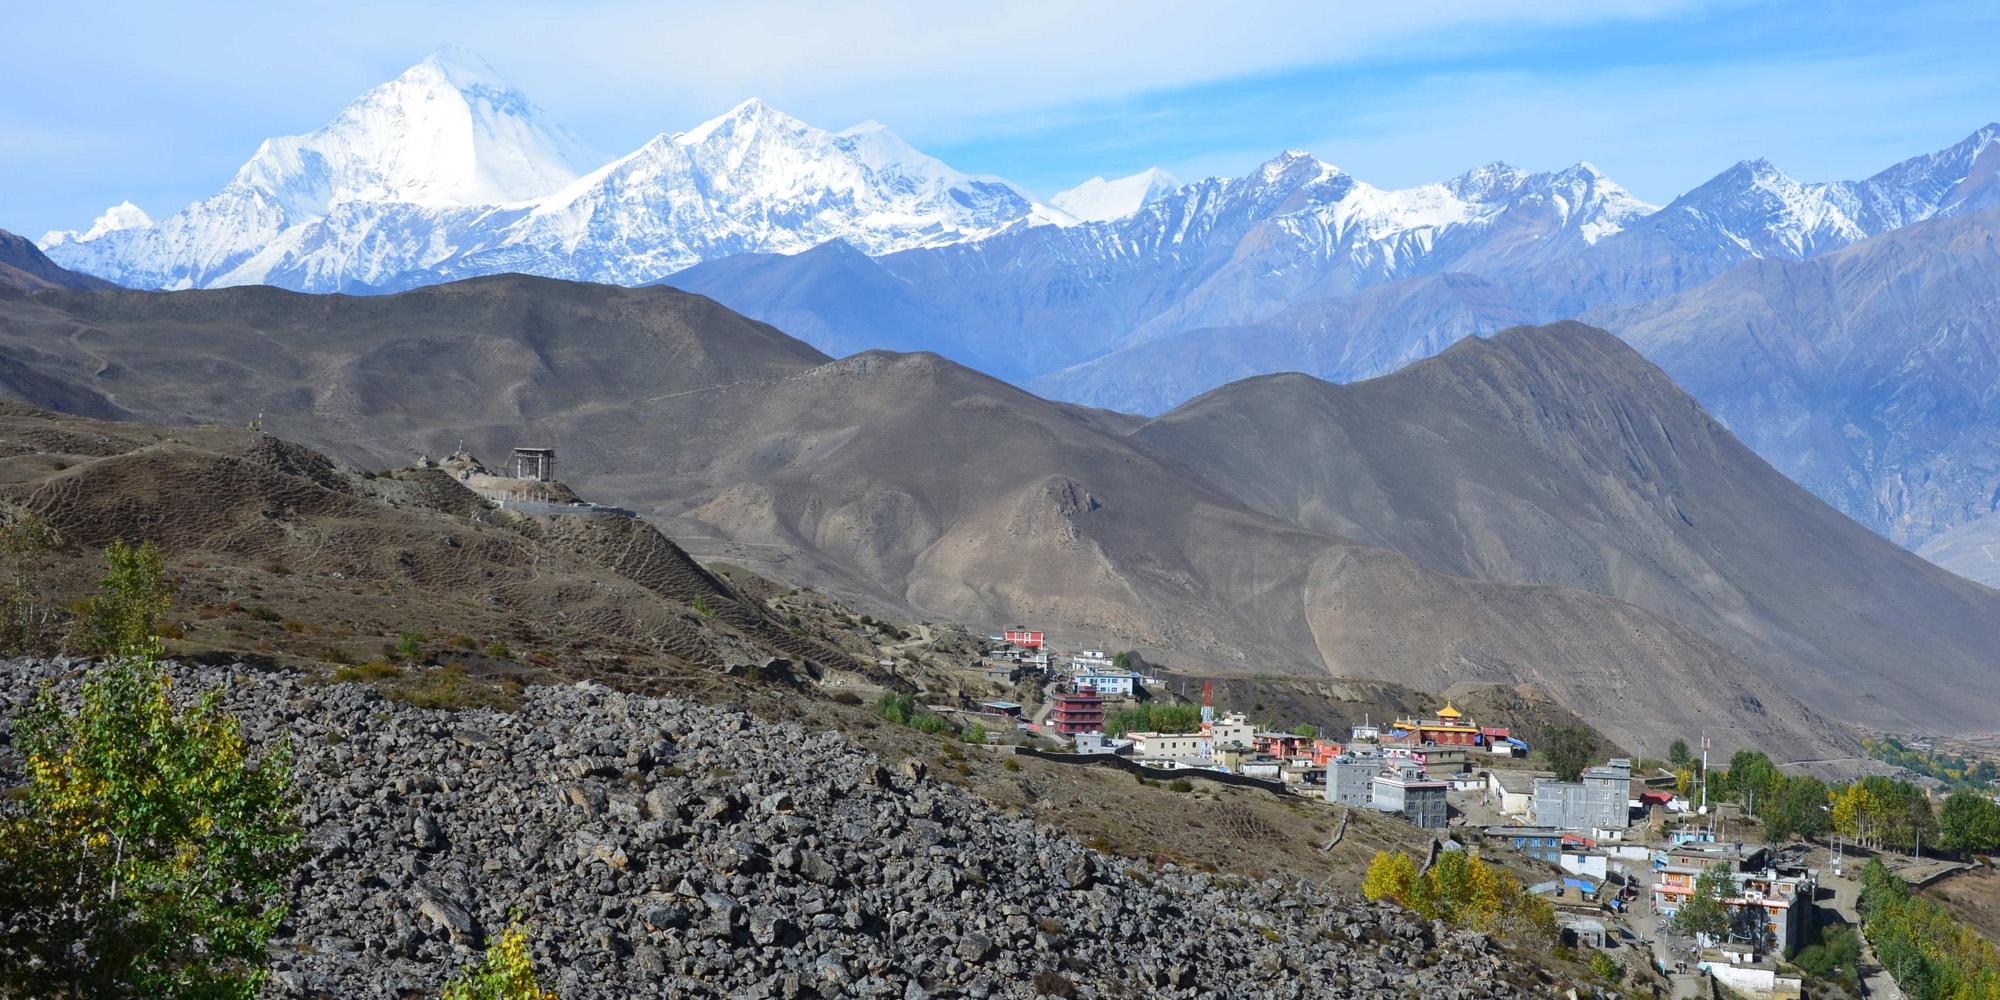 Kali Gandaki to Muktinath Trek